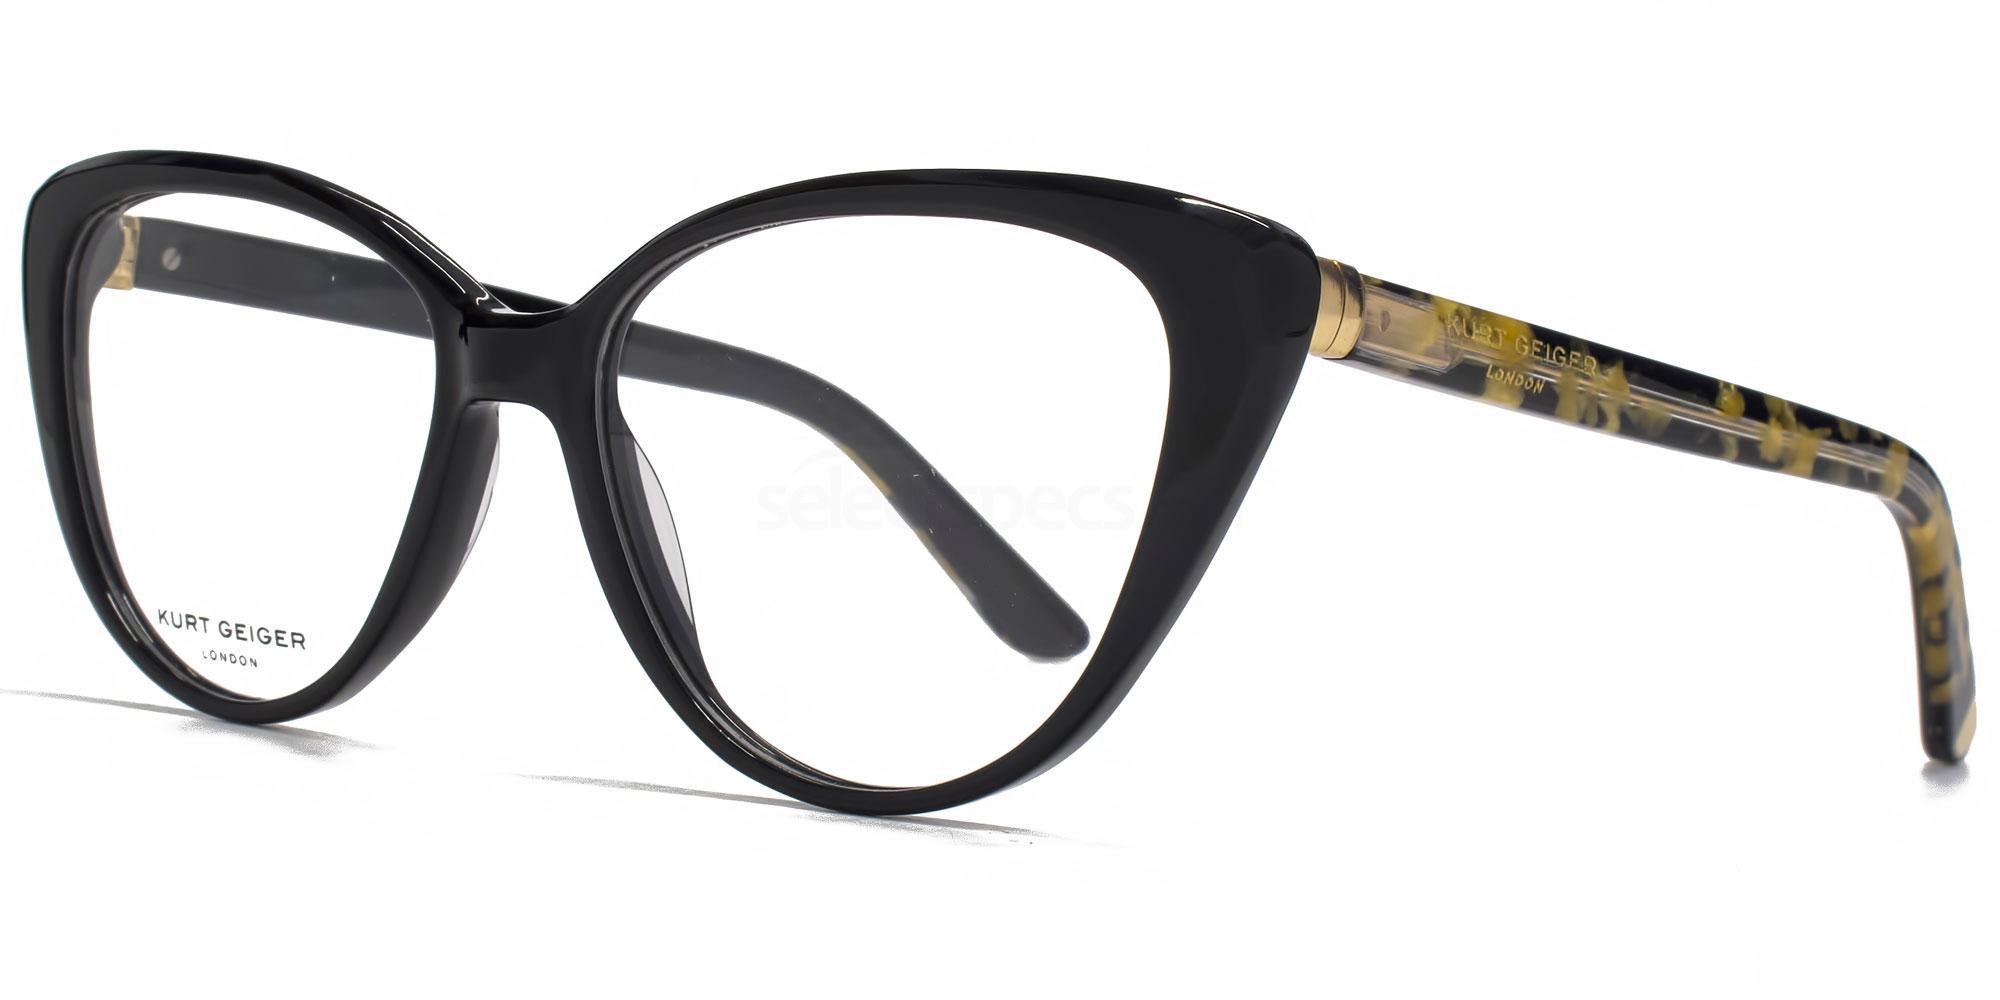 BLK KGS014 - LIBBY Glasses, Kurt Geiger London